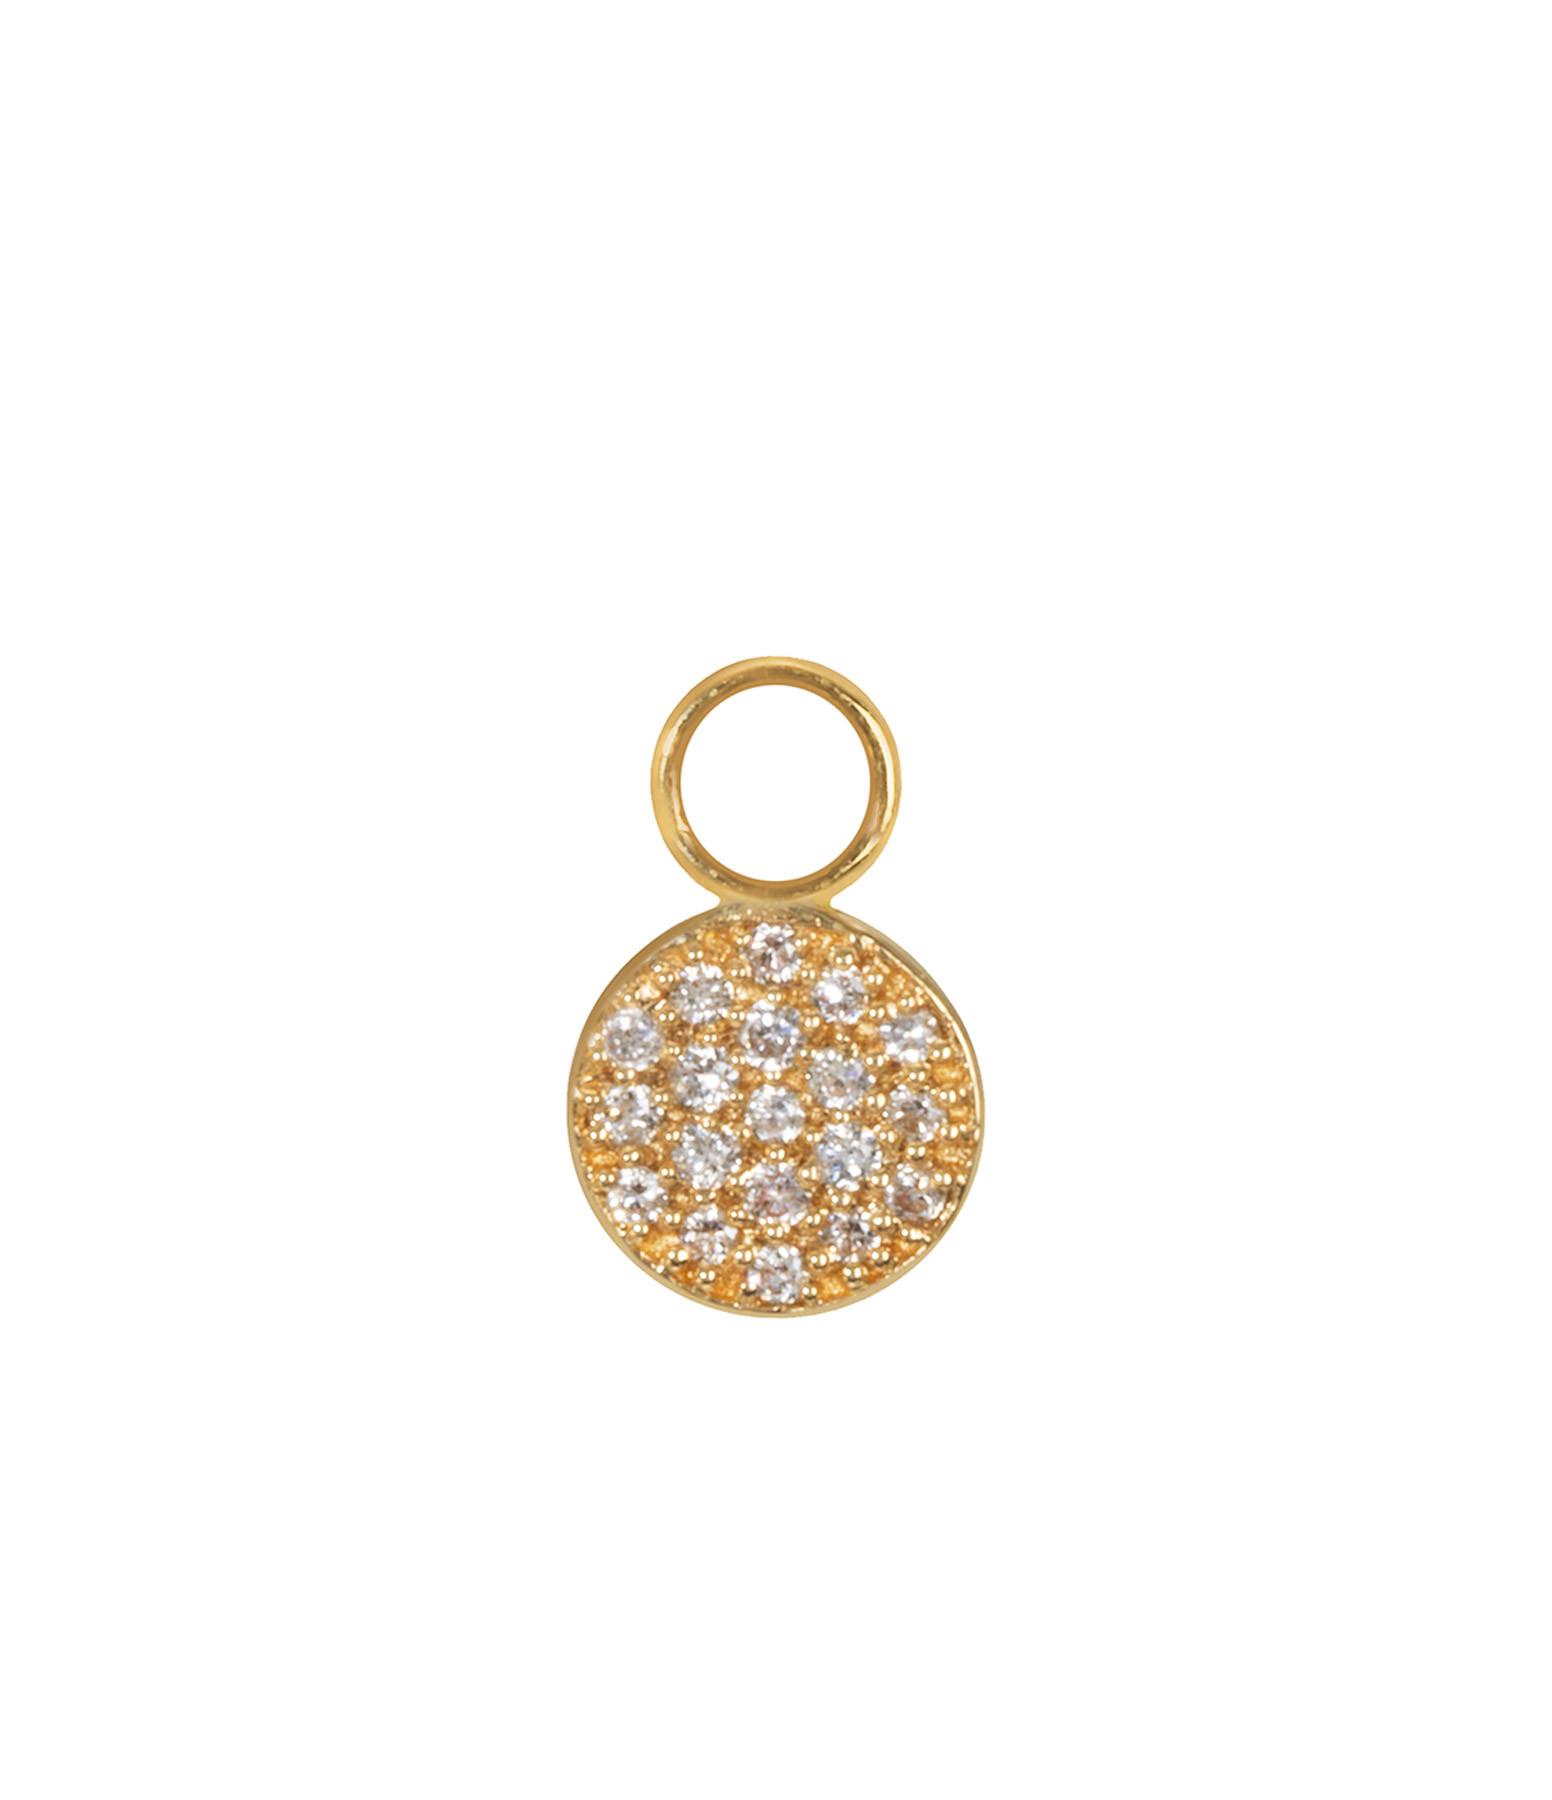 Mini Charm Pastille Or Diamants - AND PARIS